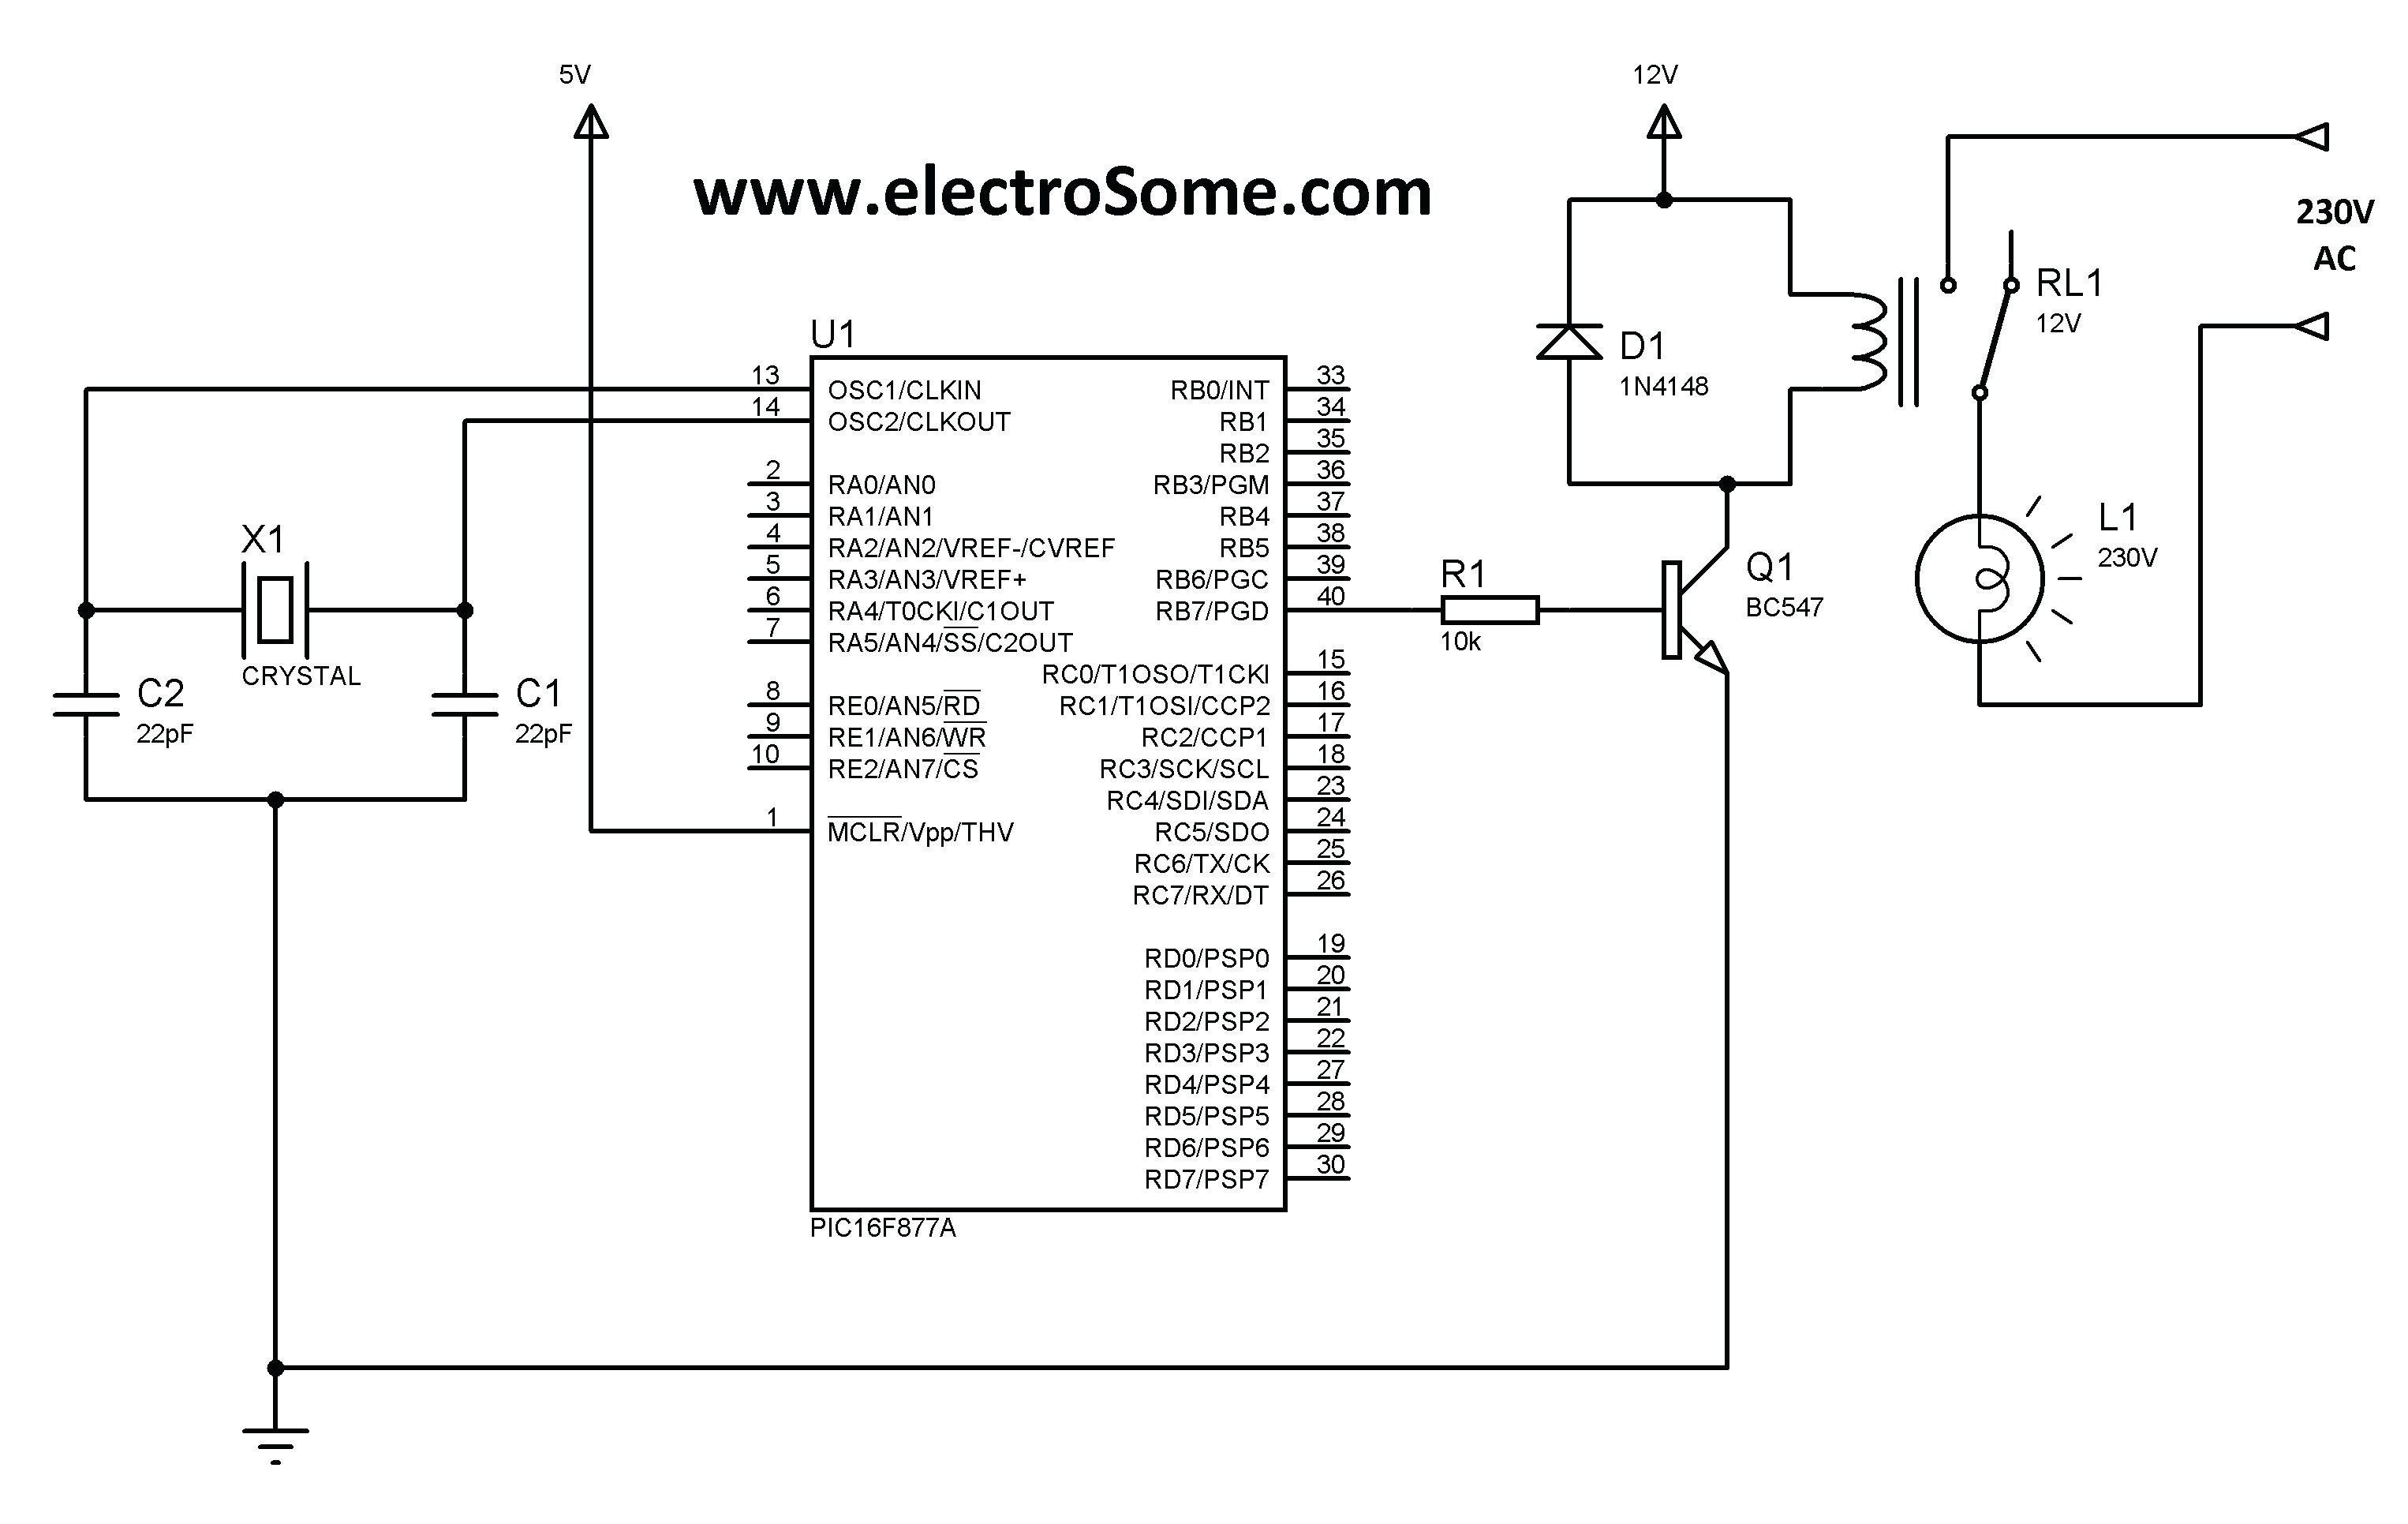 Ac Unit Contactor Wiring Diagram Hd Quality Nassi Shneiderman Diagram Altalangaleader It